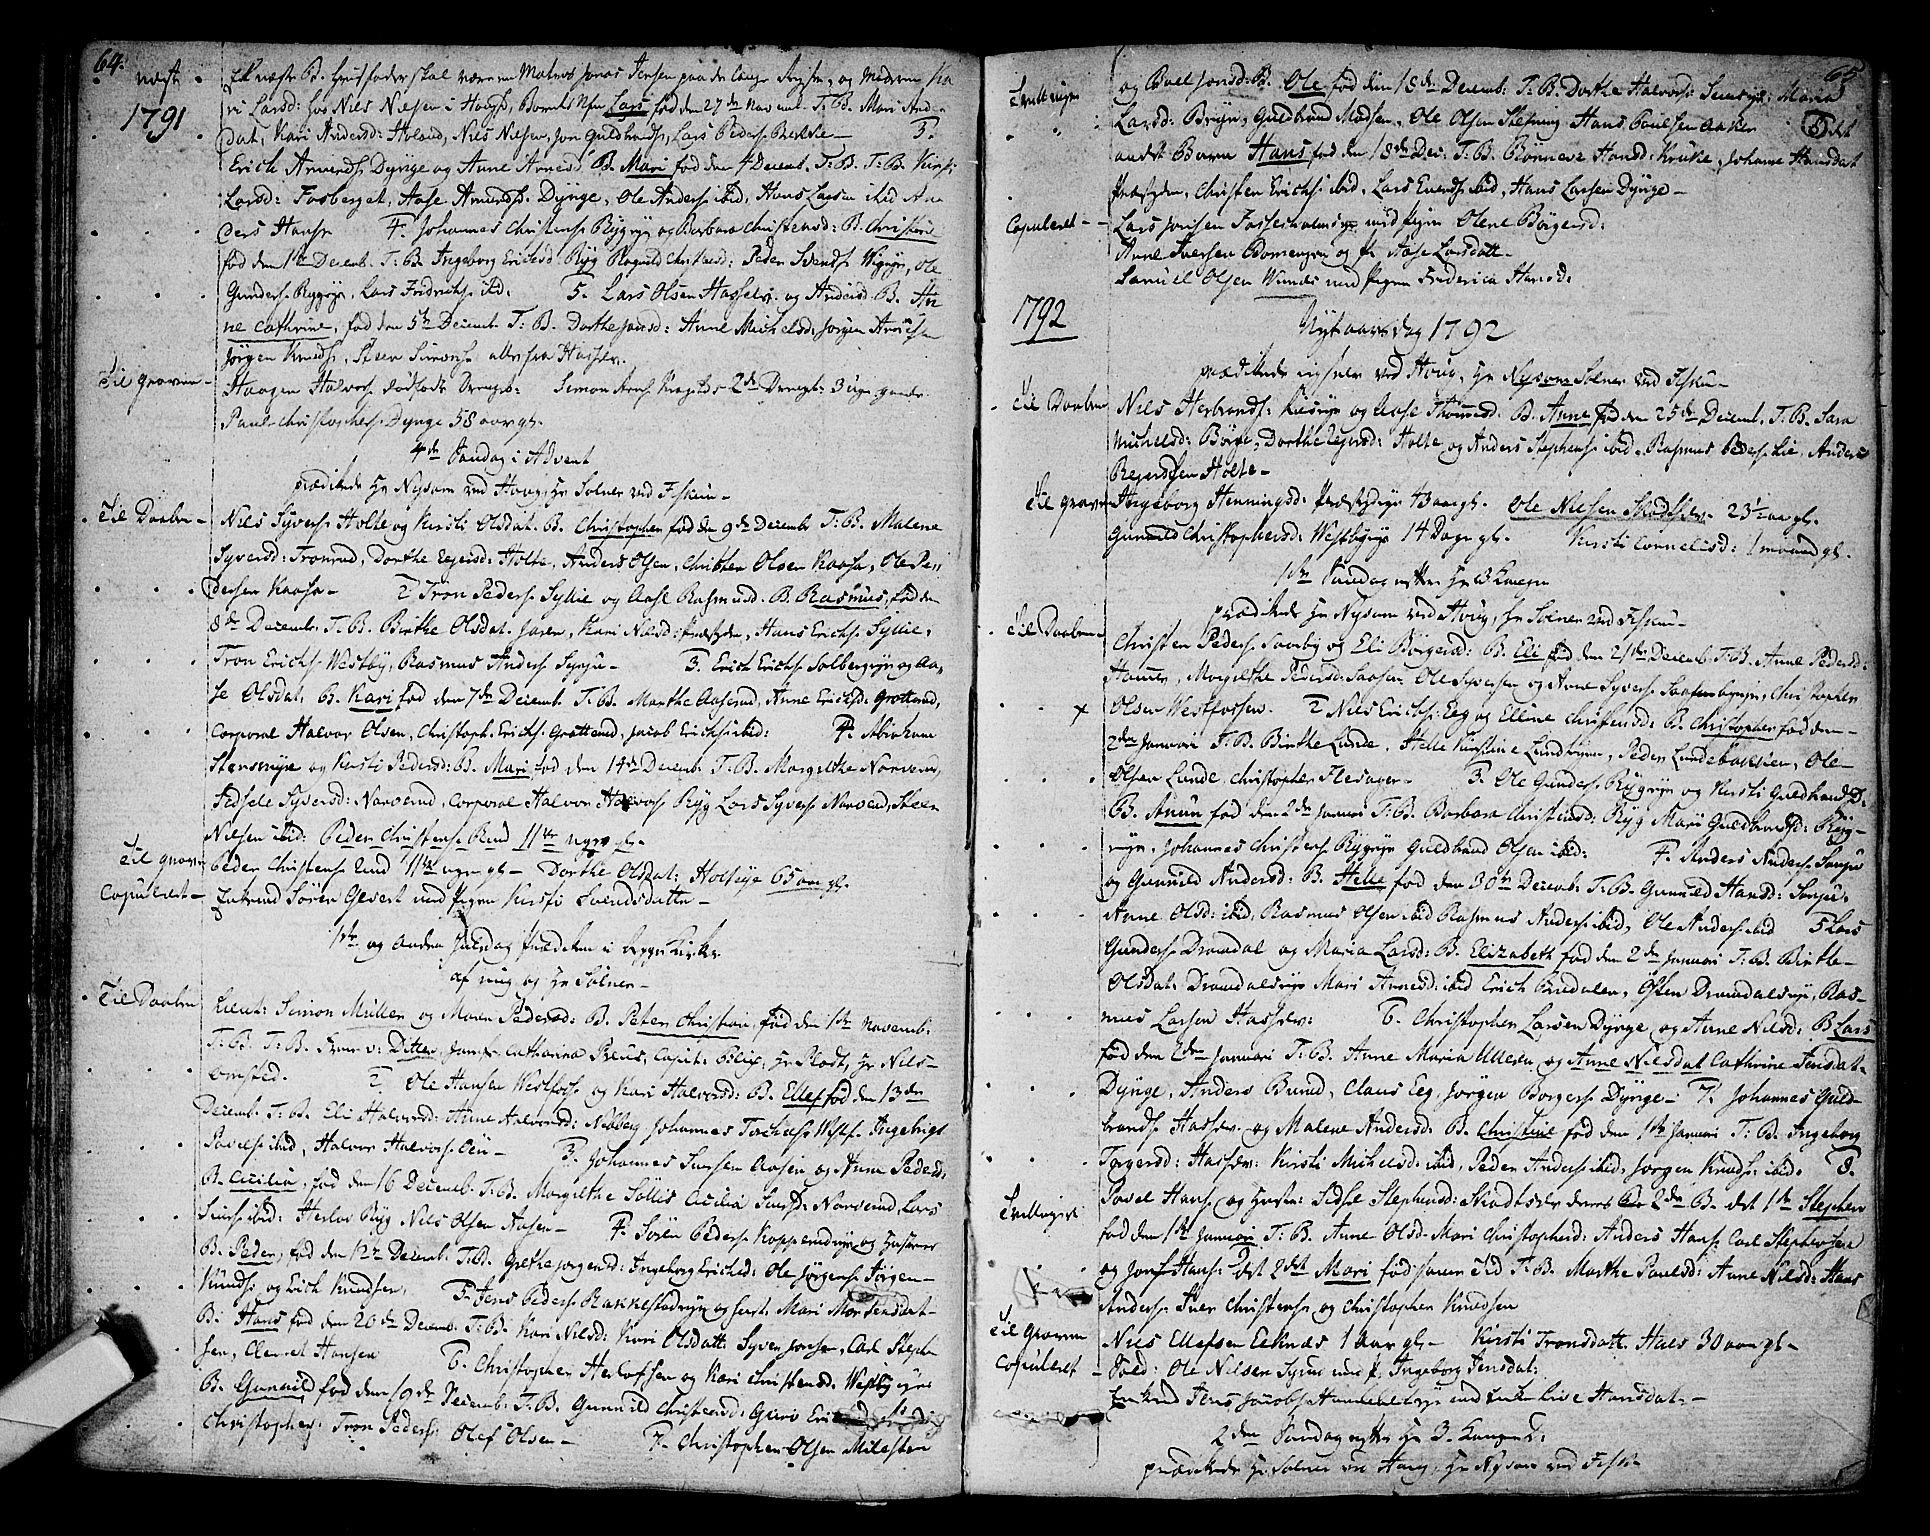 SAKO, Eiker kirkebøker, F/Fa/L0009: Ministerialbok nr. I 9, 1789-1806, s. 64-65